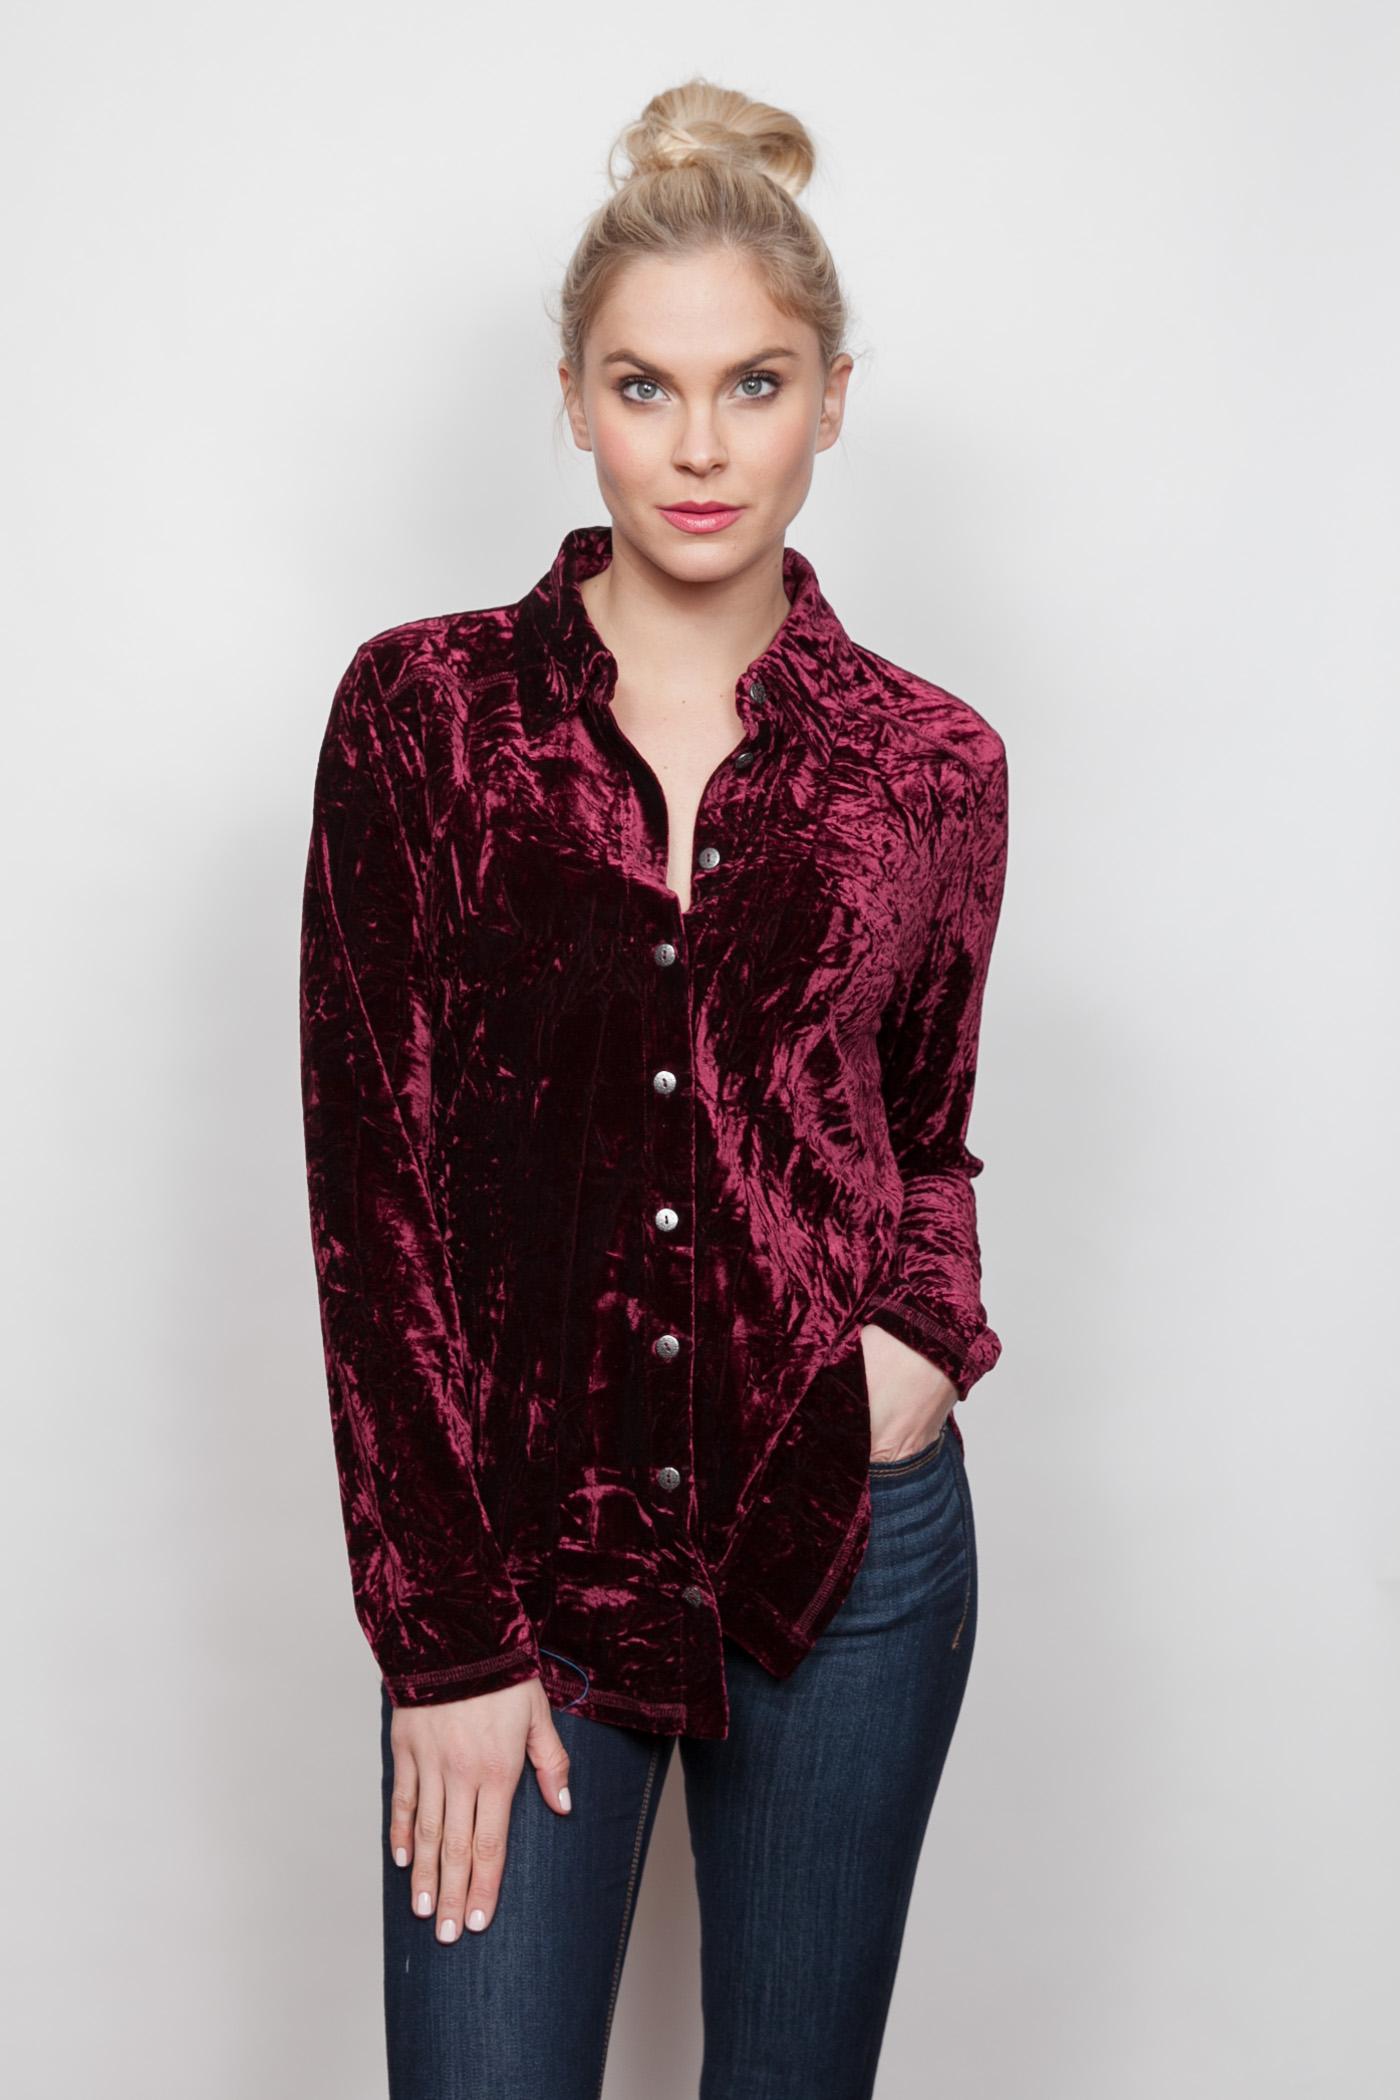 Copy of Style # 15379-18, p 12 </br>Crinkled Crushed Velvet </br>Color: Merlot + Black, Sapphire